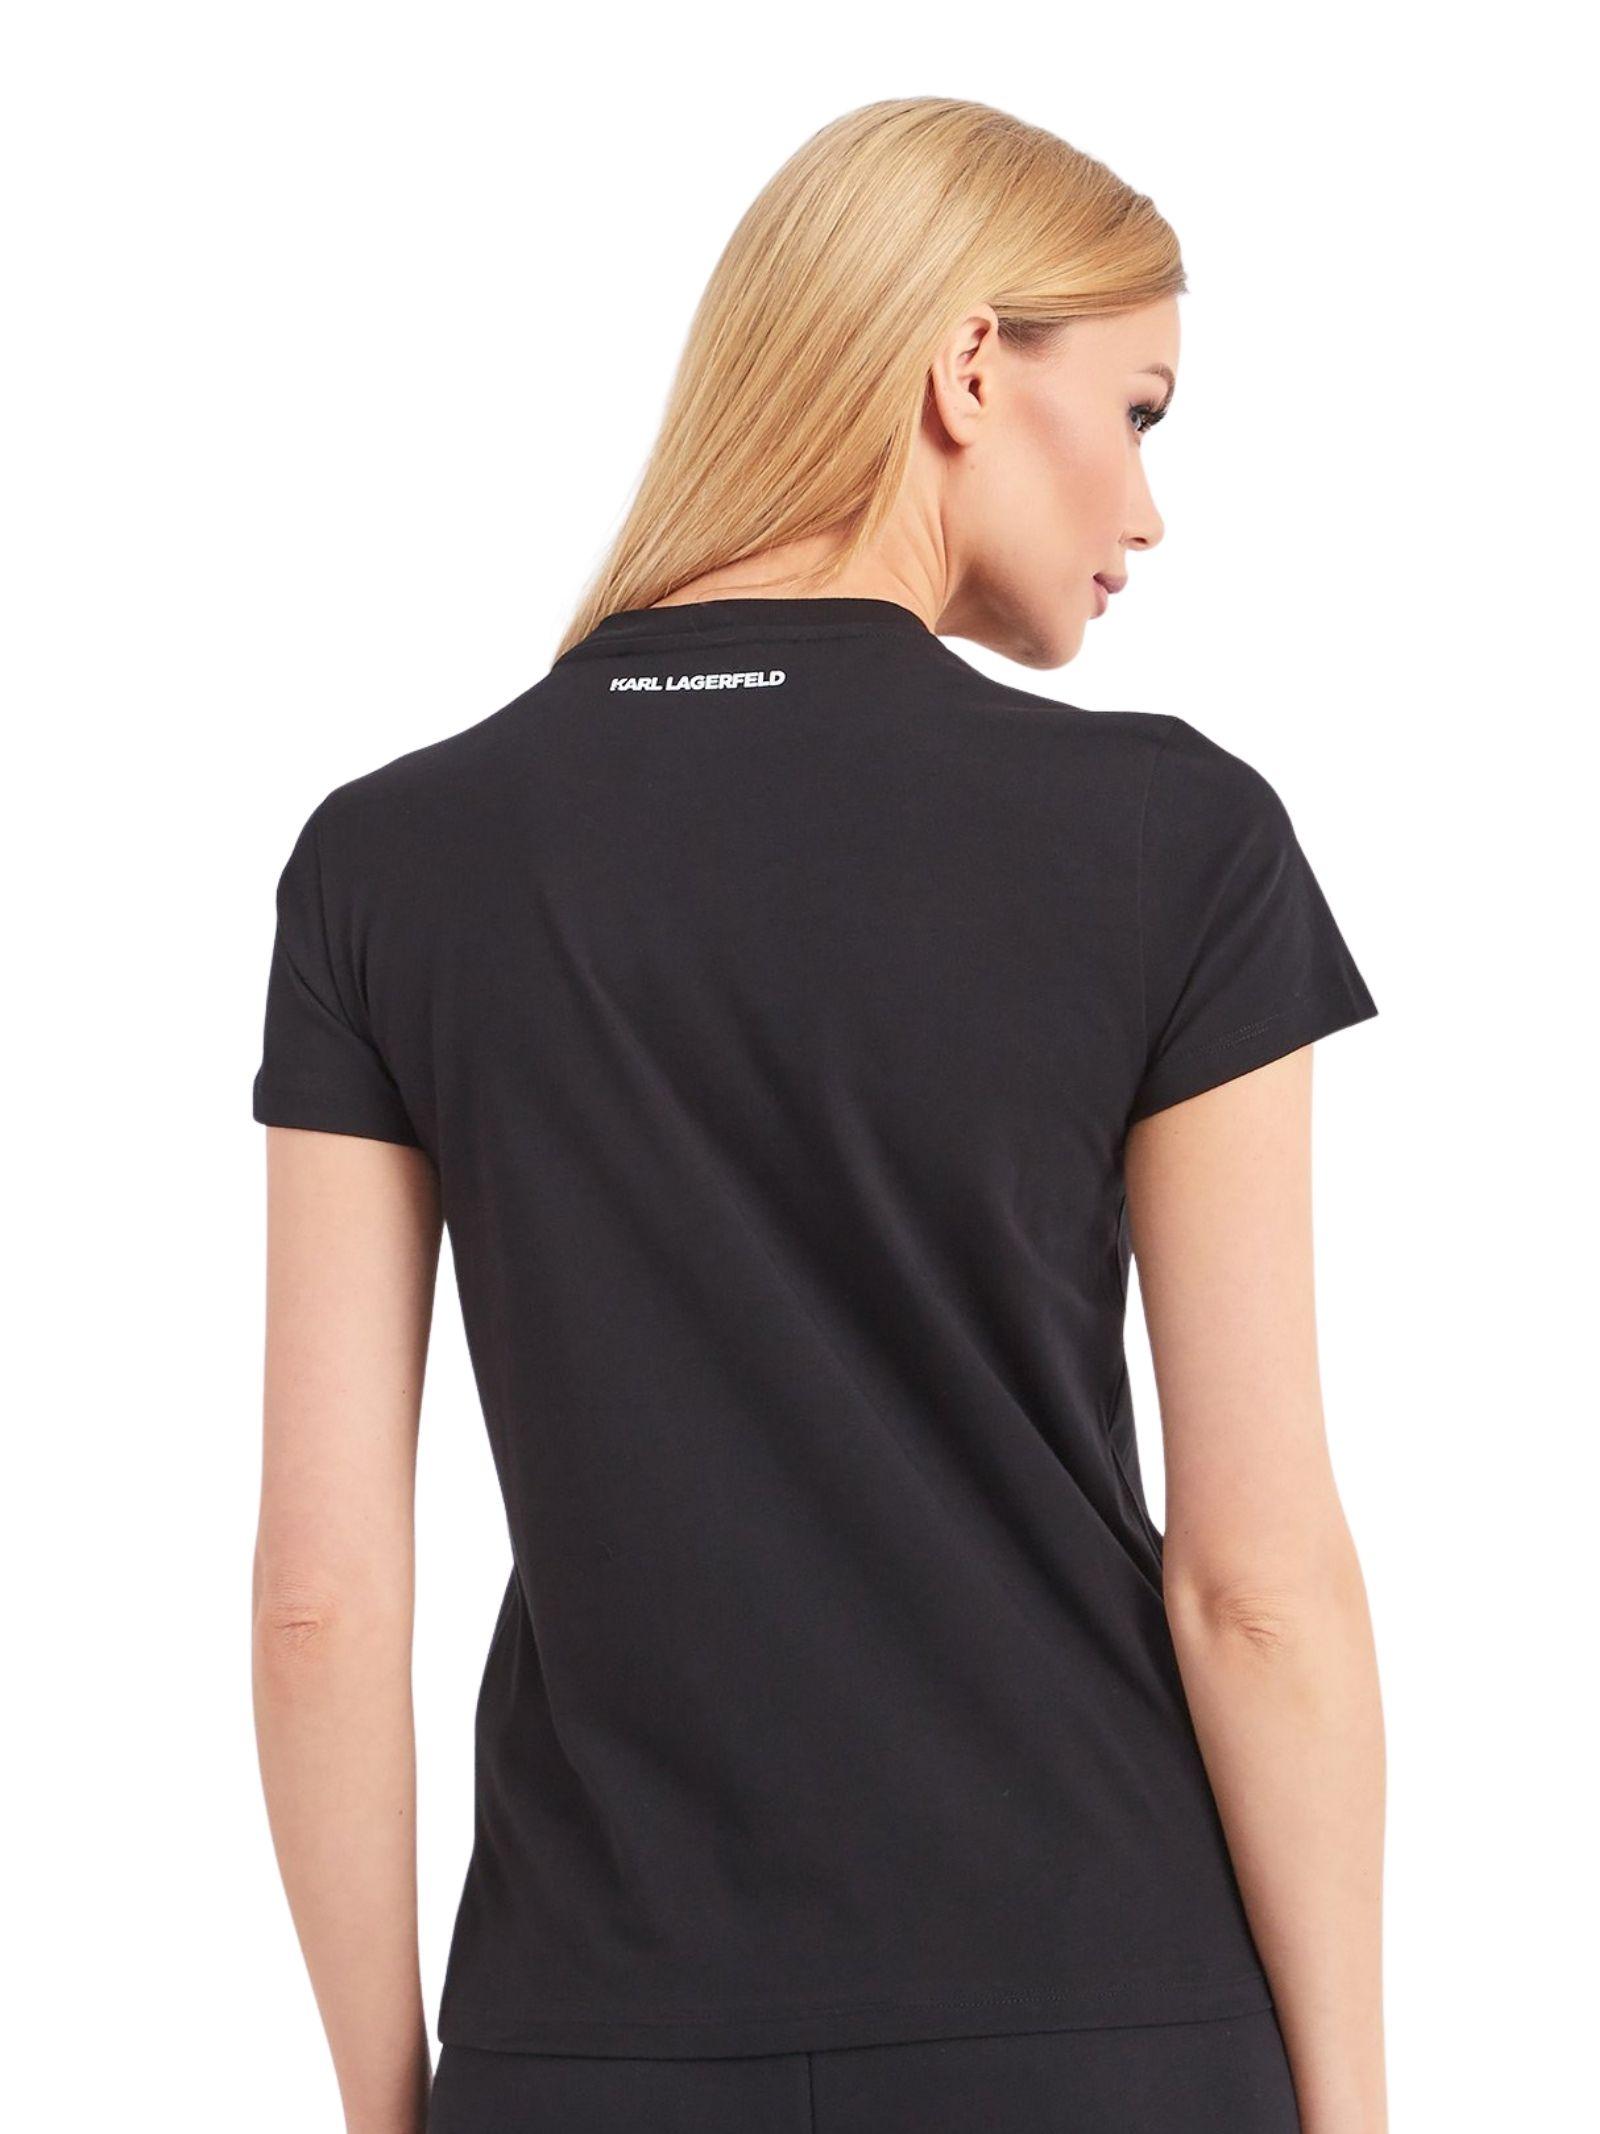 T-shirt con strass applicati KARL LAGERFELD   T-shirt   210W1726.21999